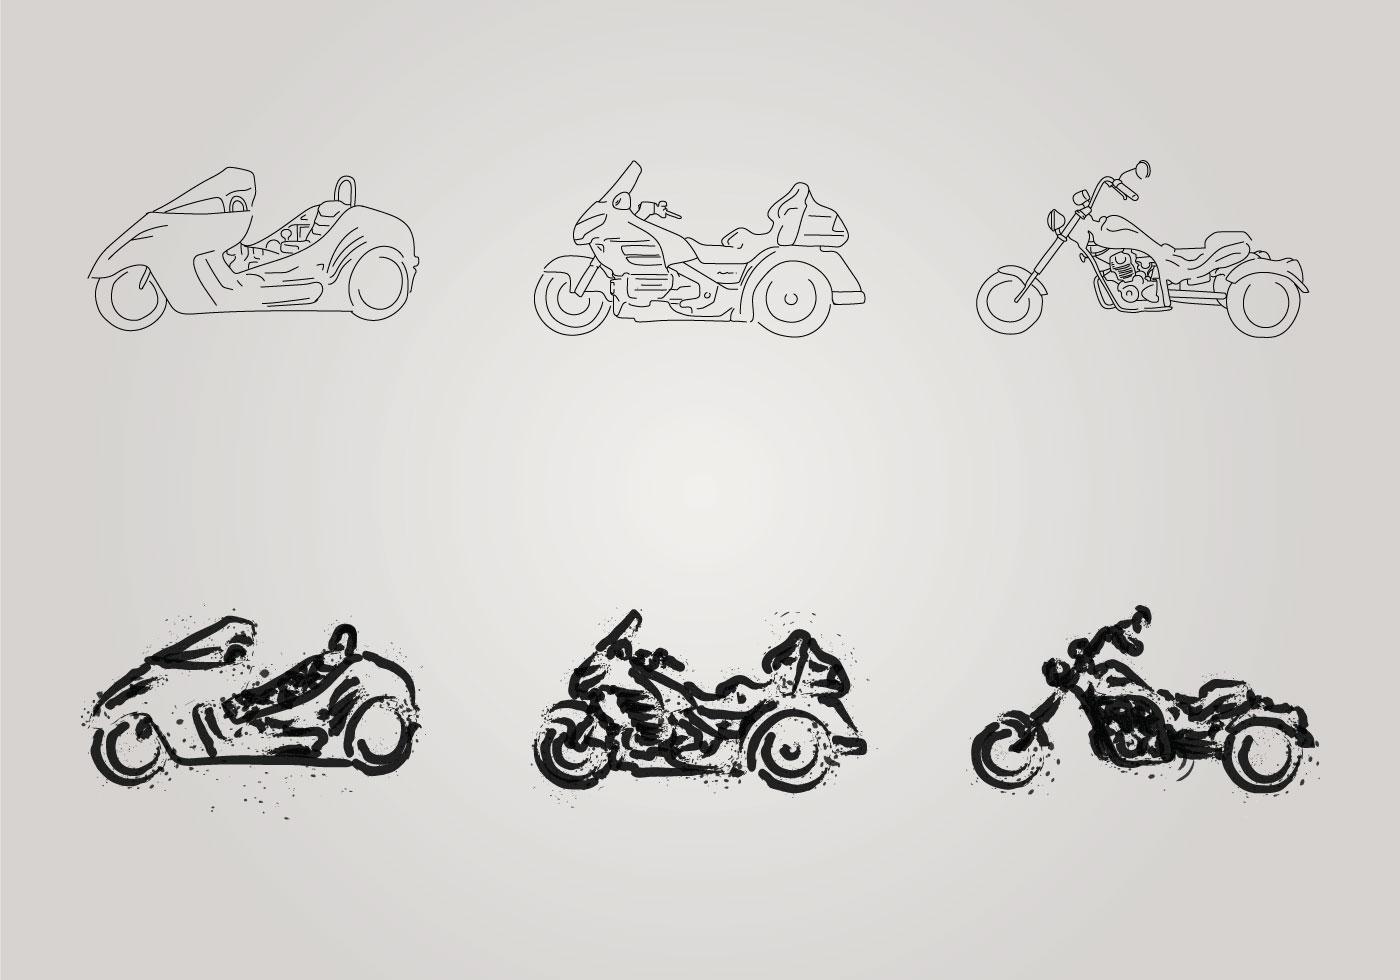 Free Motor Trike Vector Illustration Download Art Wiring Diagram Stock Graphics Images